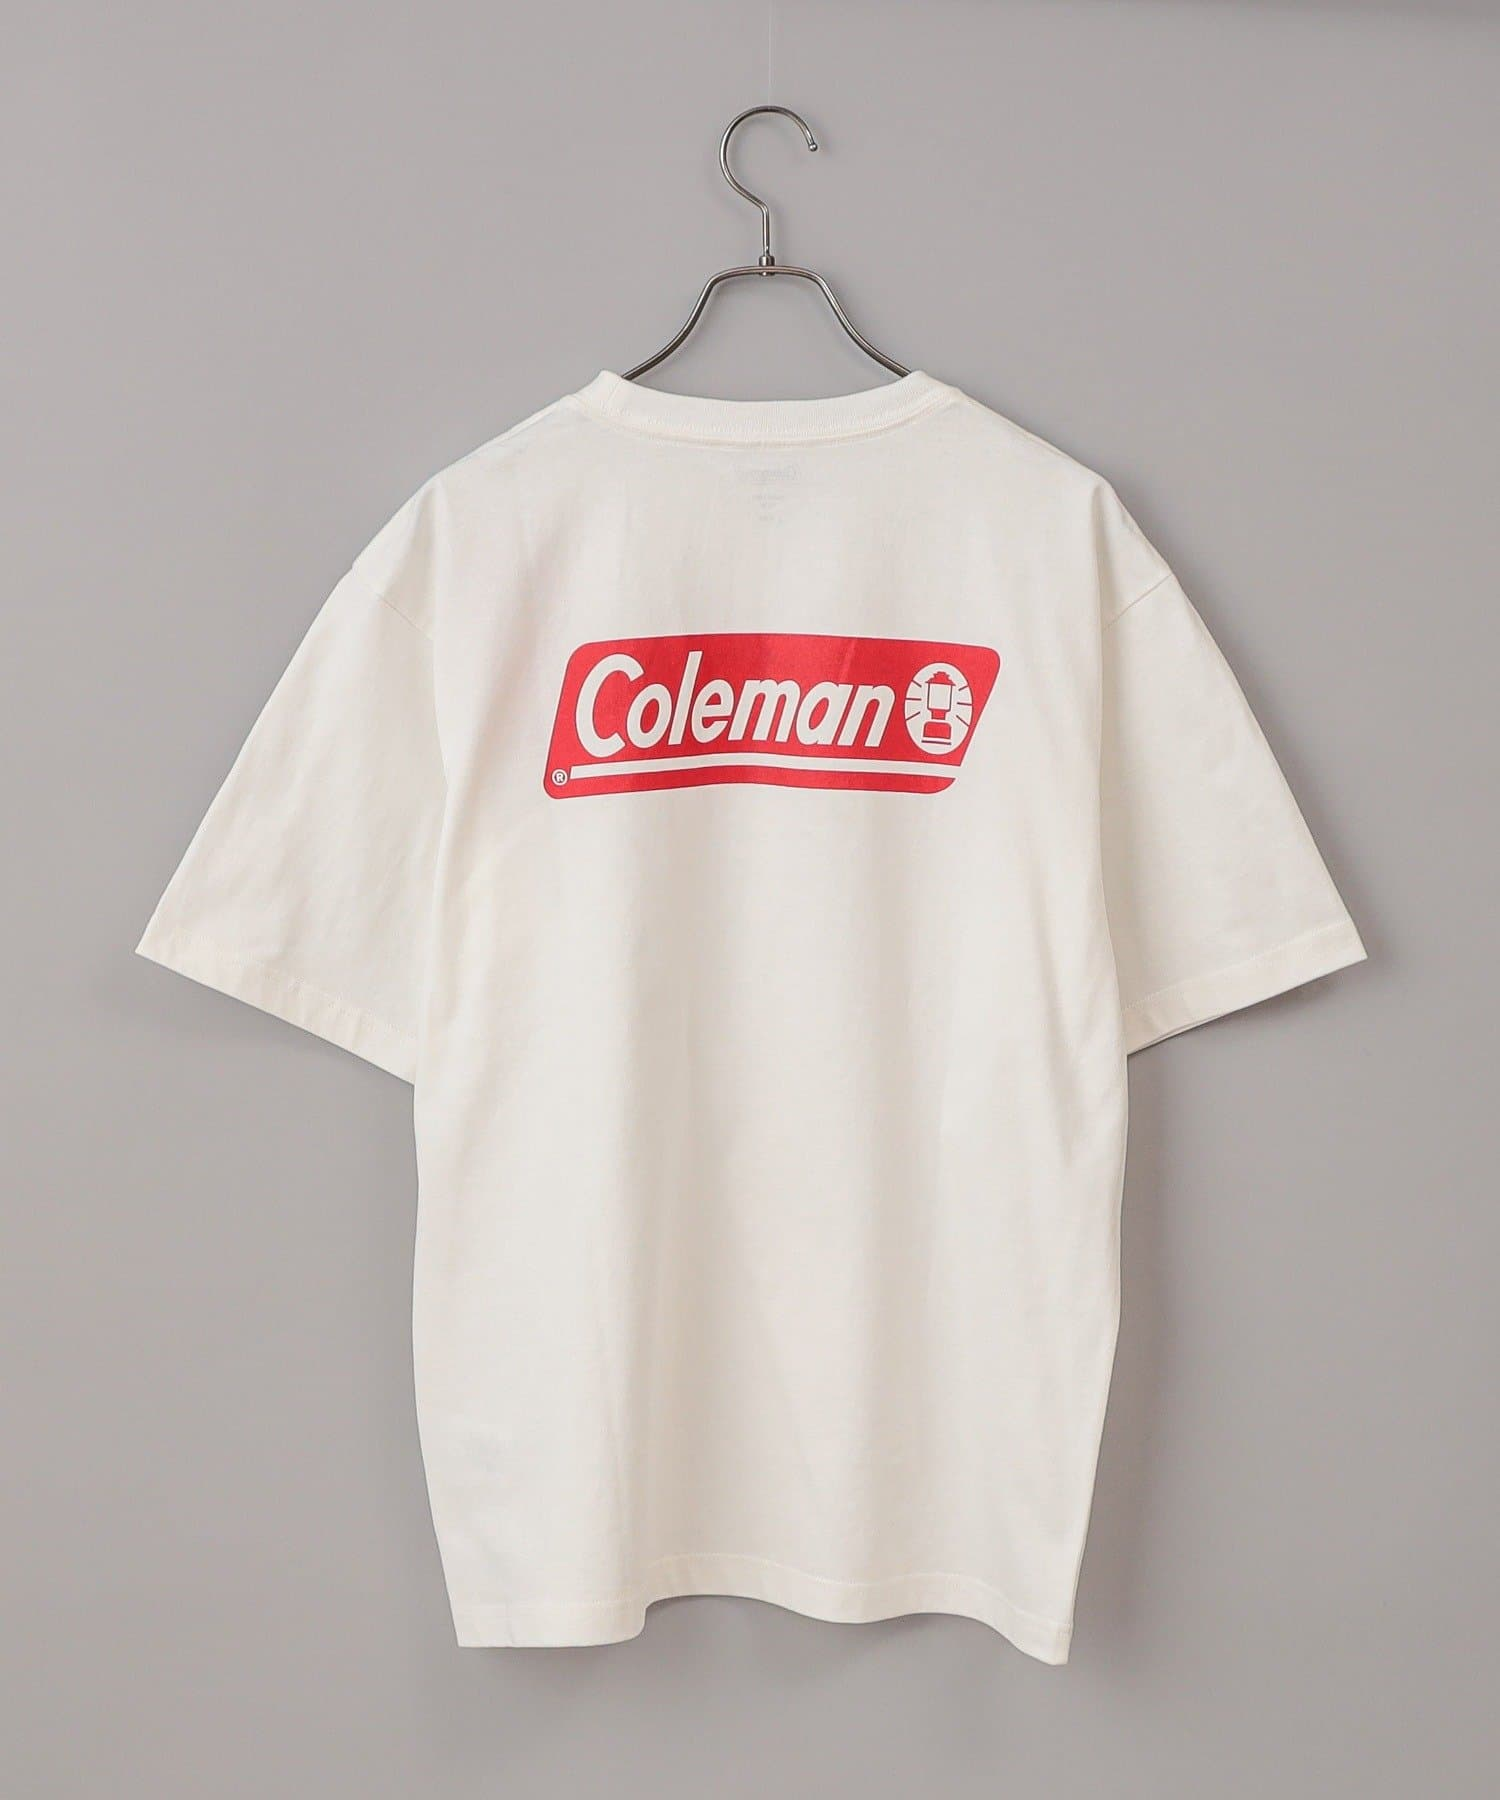 CIAOPANIC(チャオパニック) メンズ 【Coleman/コールマン】ロゴバックプリントクルーネック半袖Tシャツ ホワイト